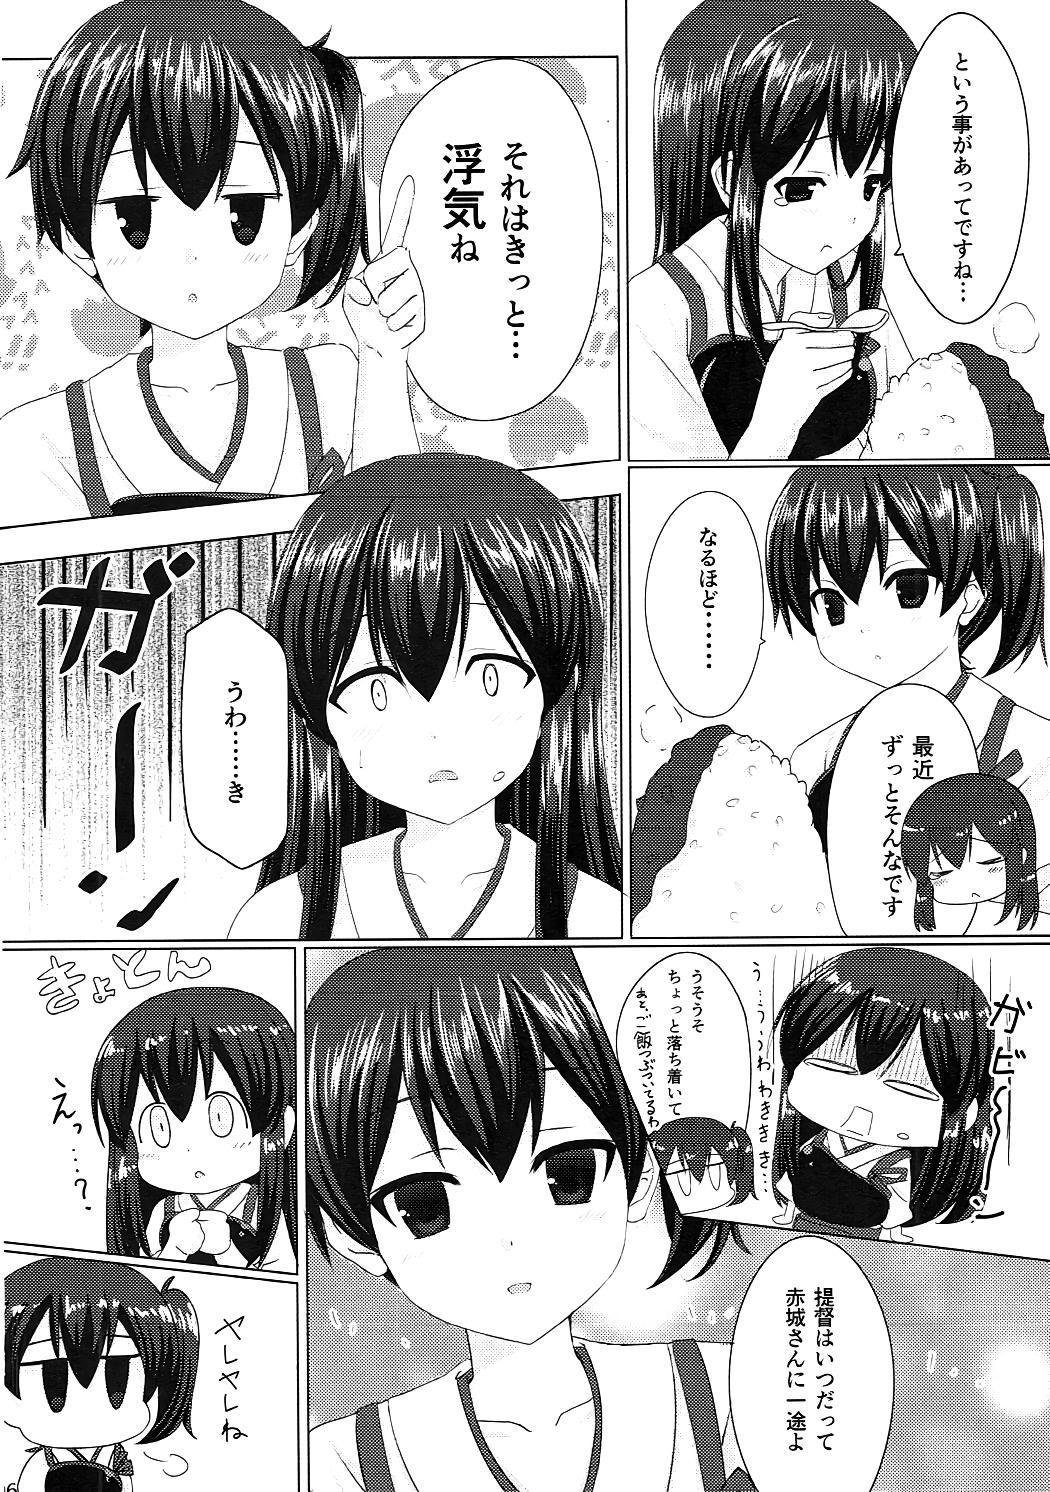 Akagi-san to Kekkon Kakko Kari 4